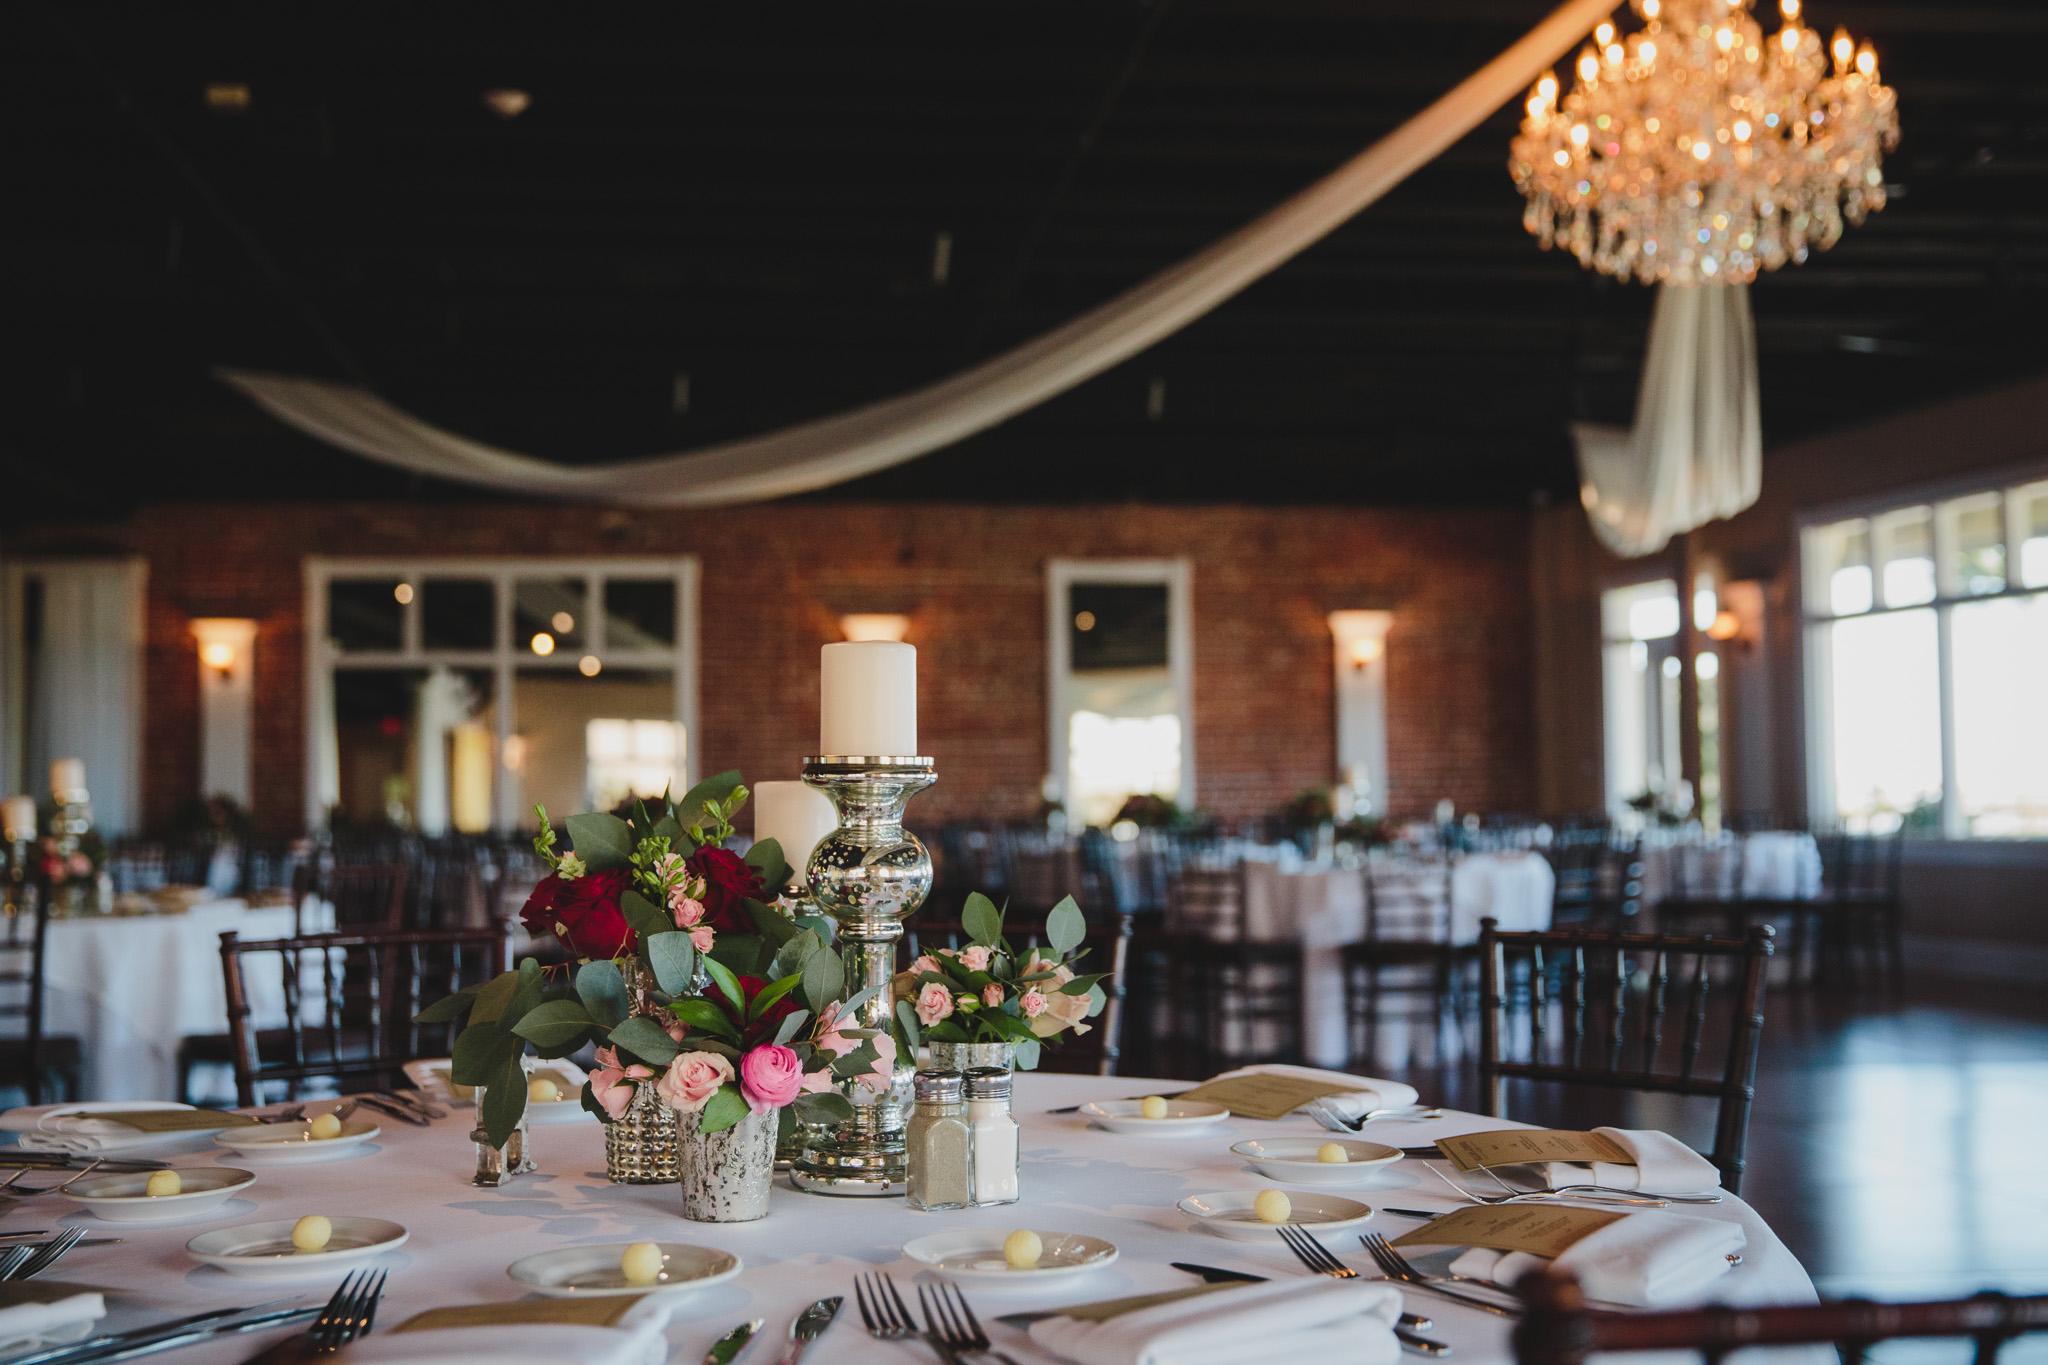 white-room-st-augustine-florida-reception-grand-ballroom